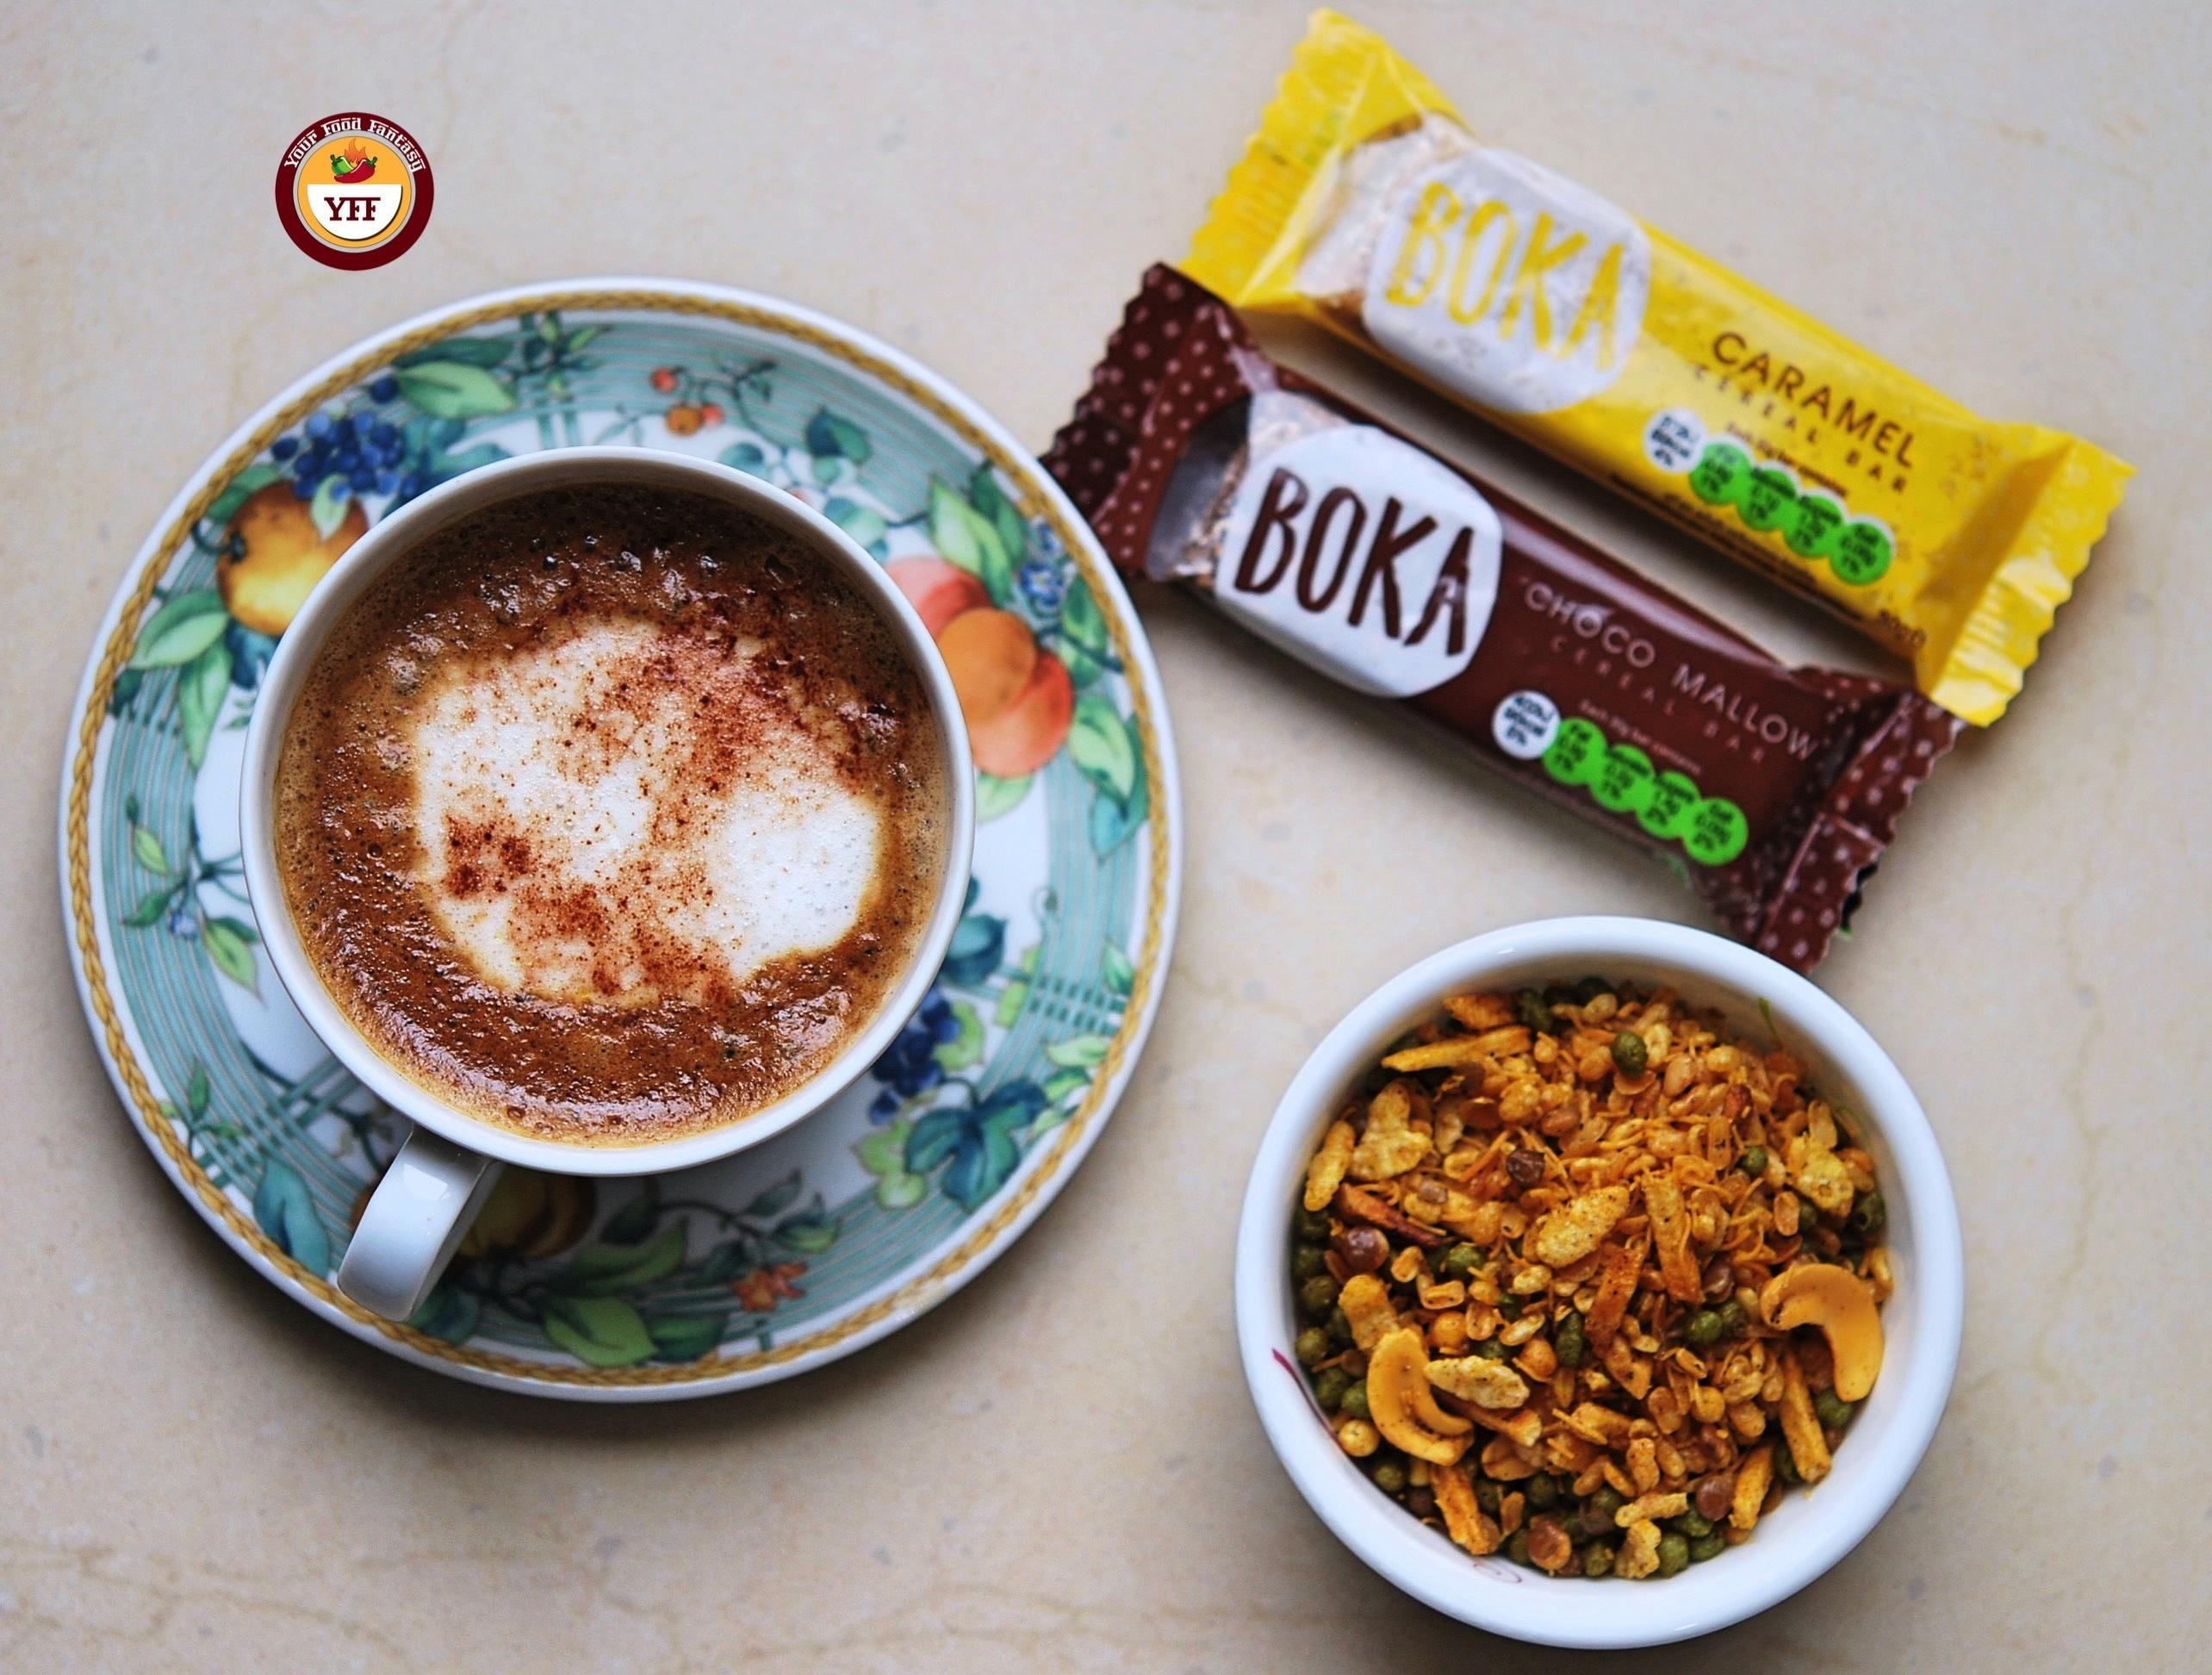 Boka Cereal Bar review   Your Food Fantasy